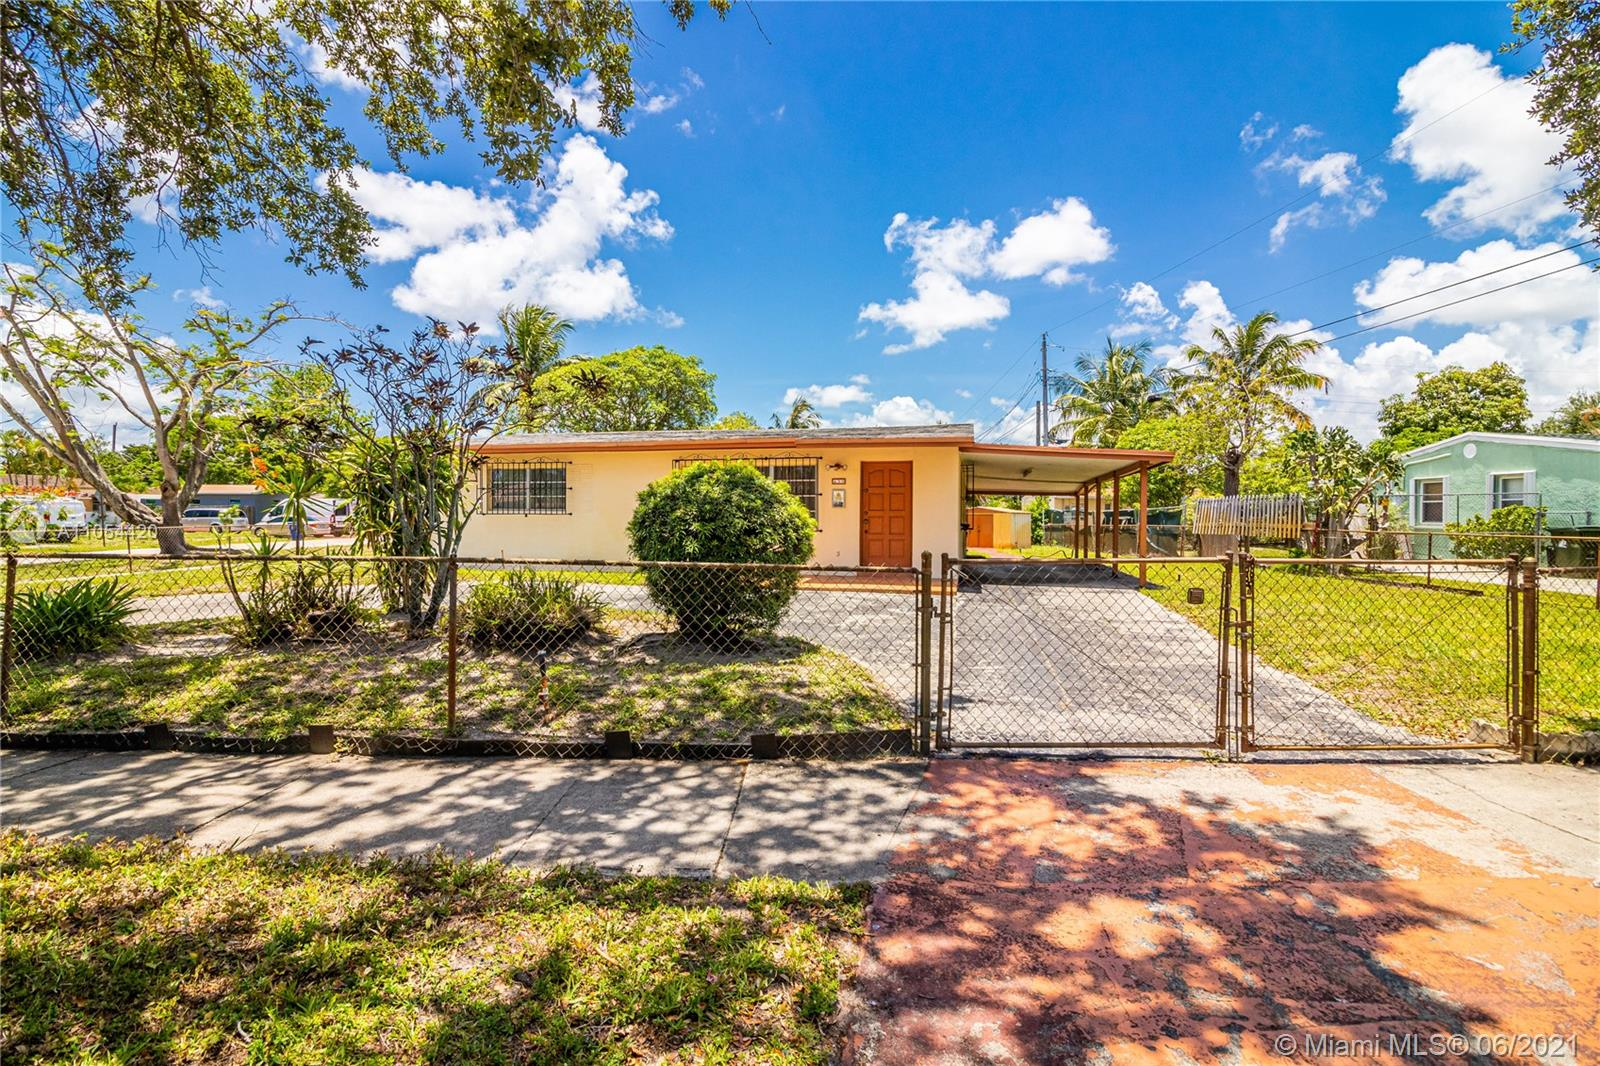 Riverland - 439 SW 24 Avenue, Fort Lauderdale, FL 33312